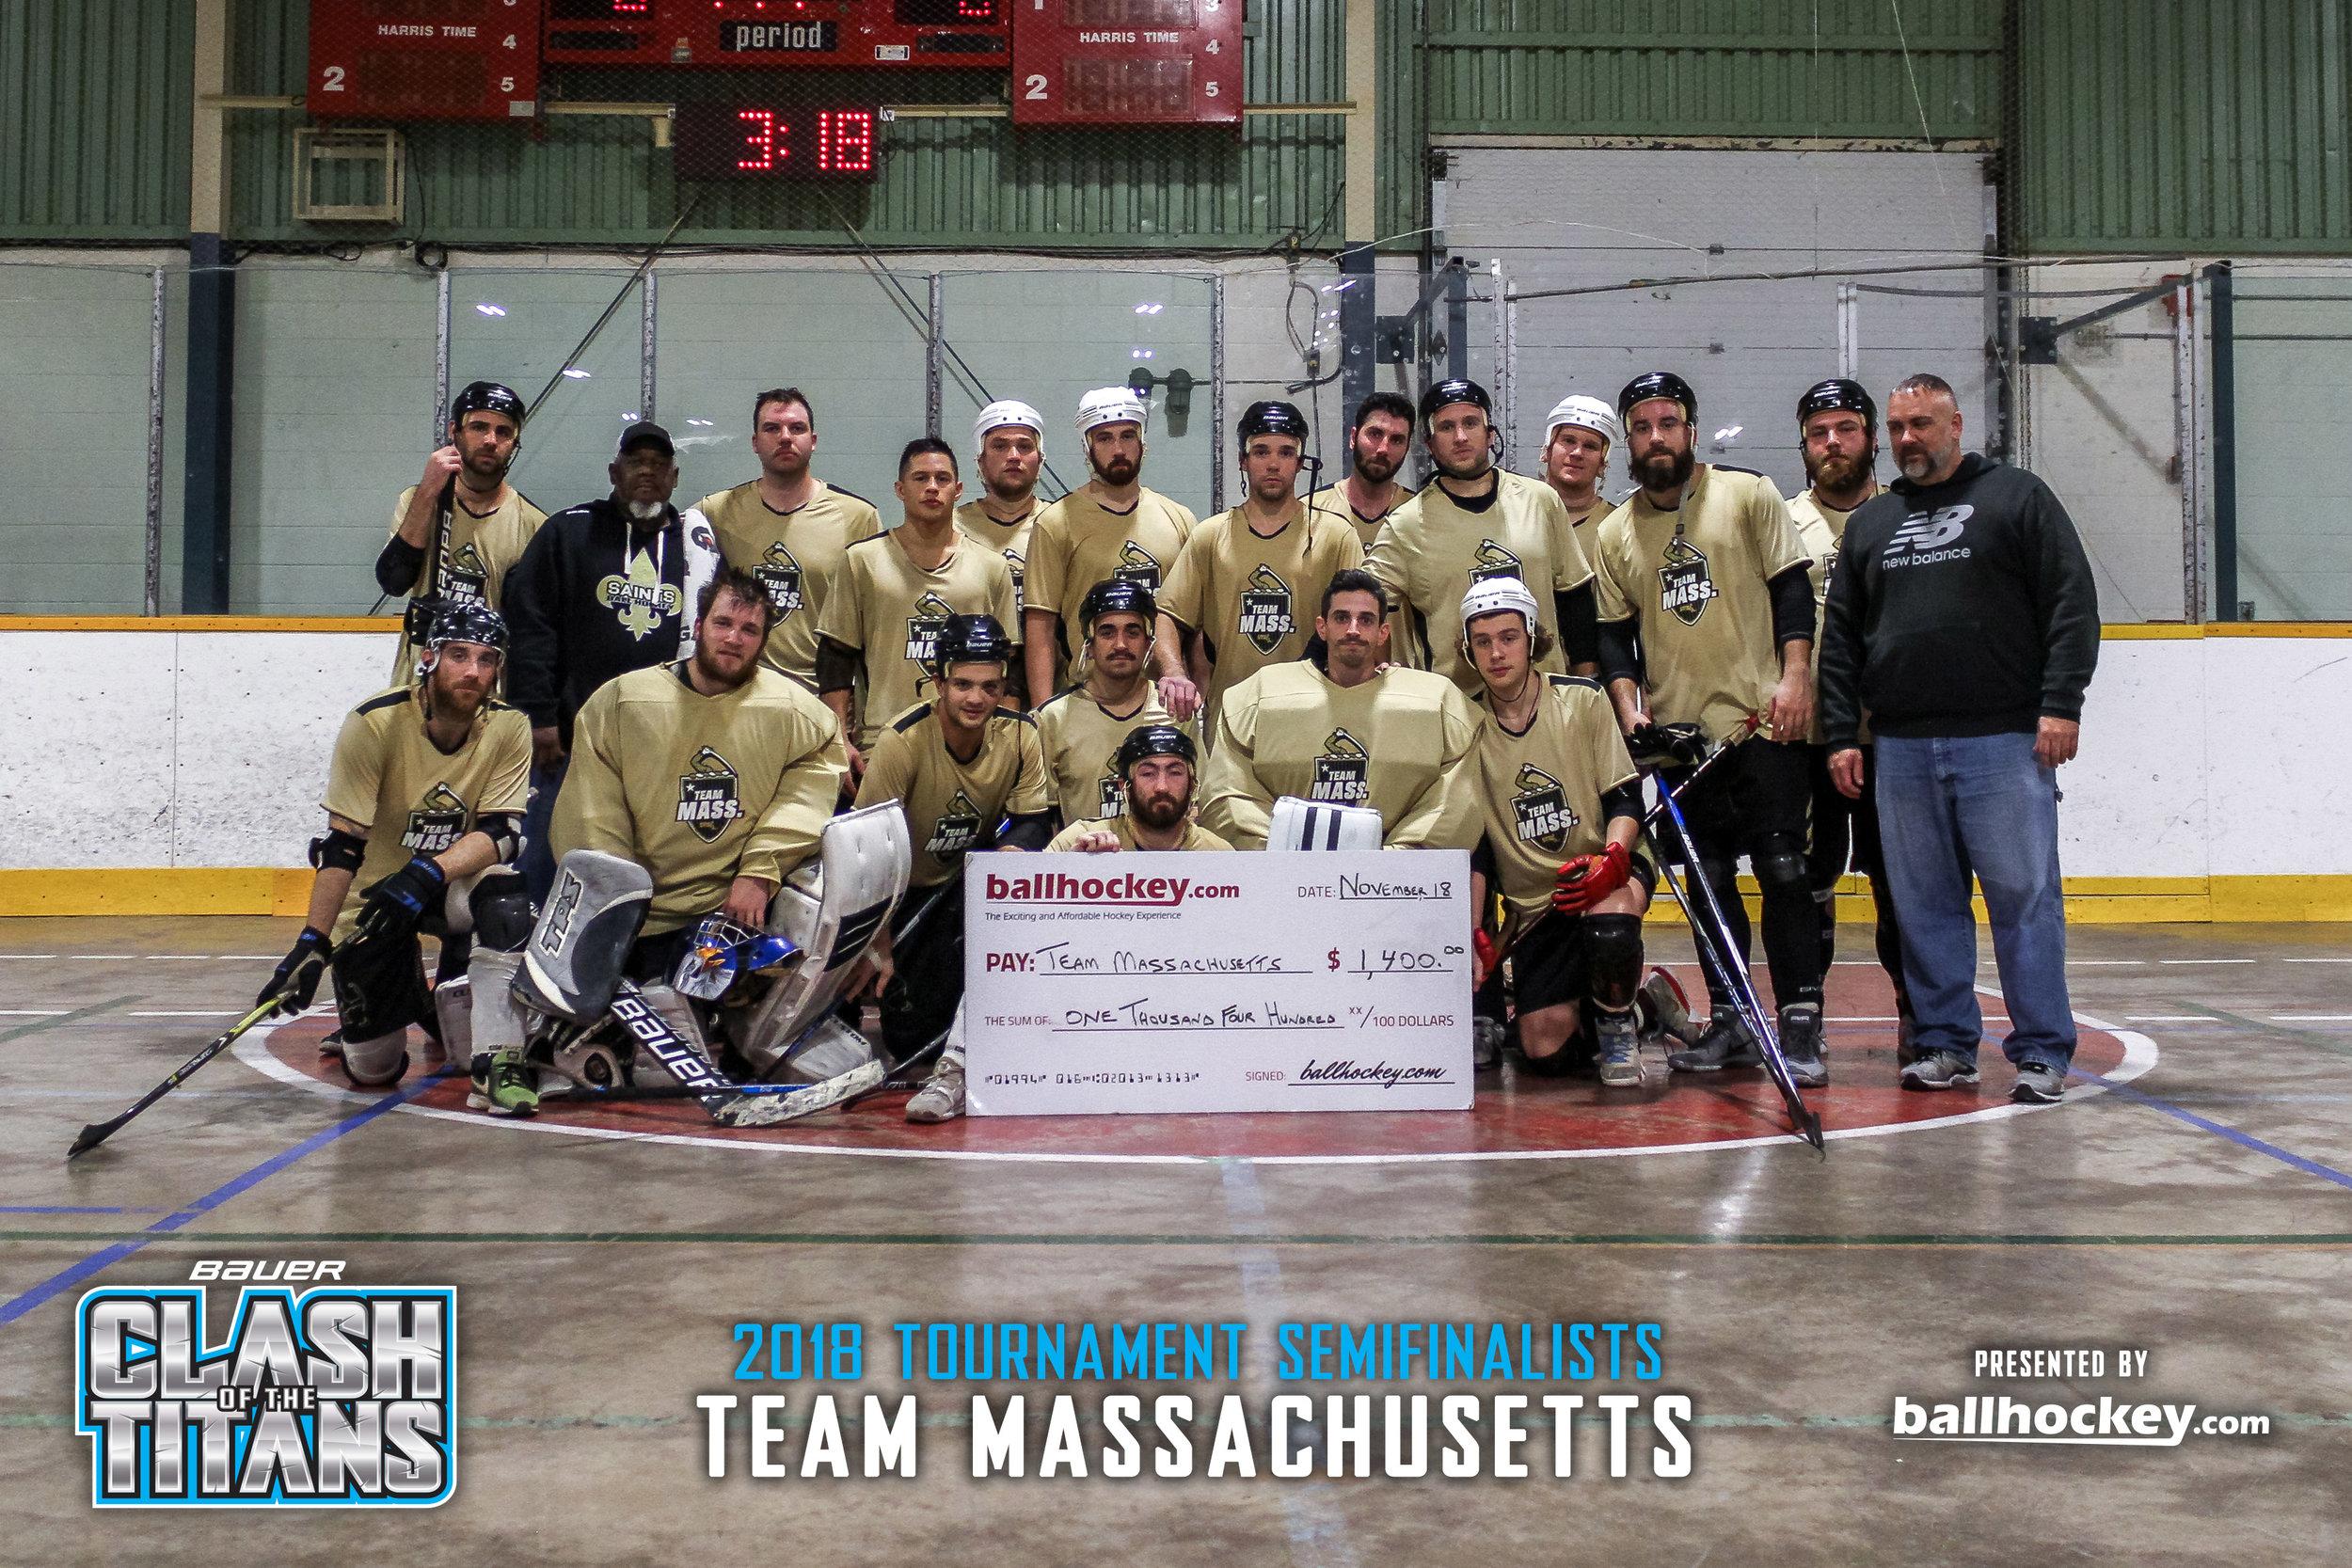 COTT_2018_Tournament_Semifinalists_Team_Massachusetts.jpg